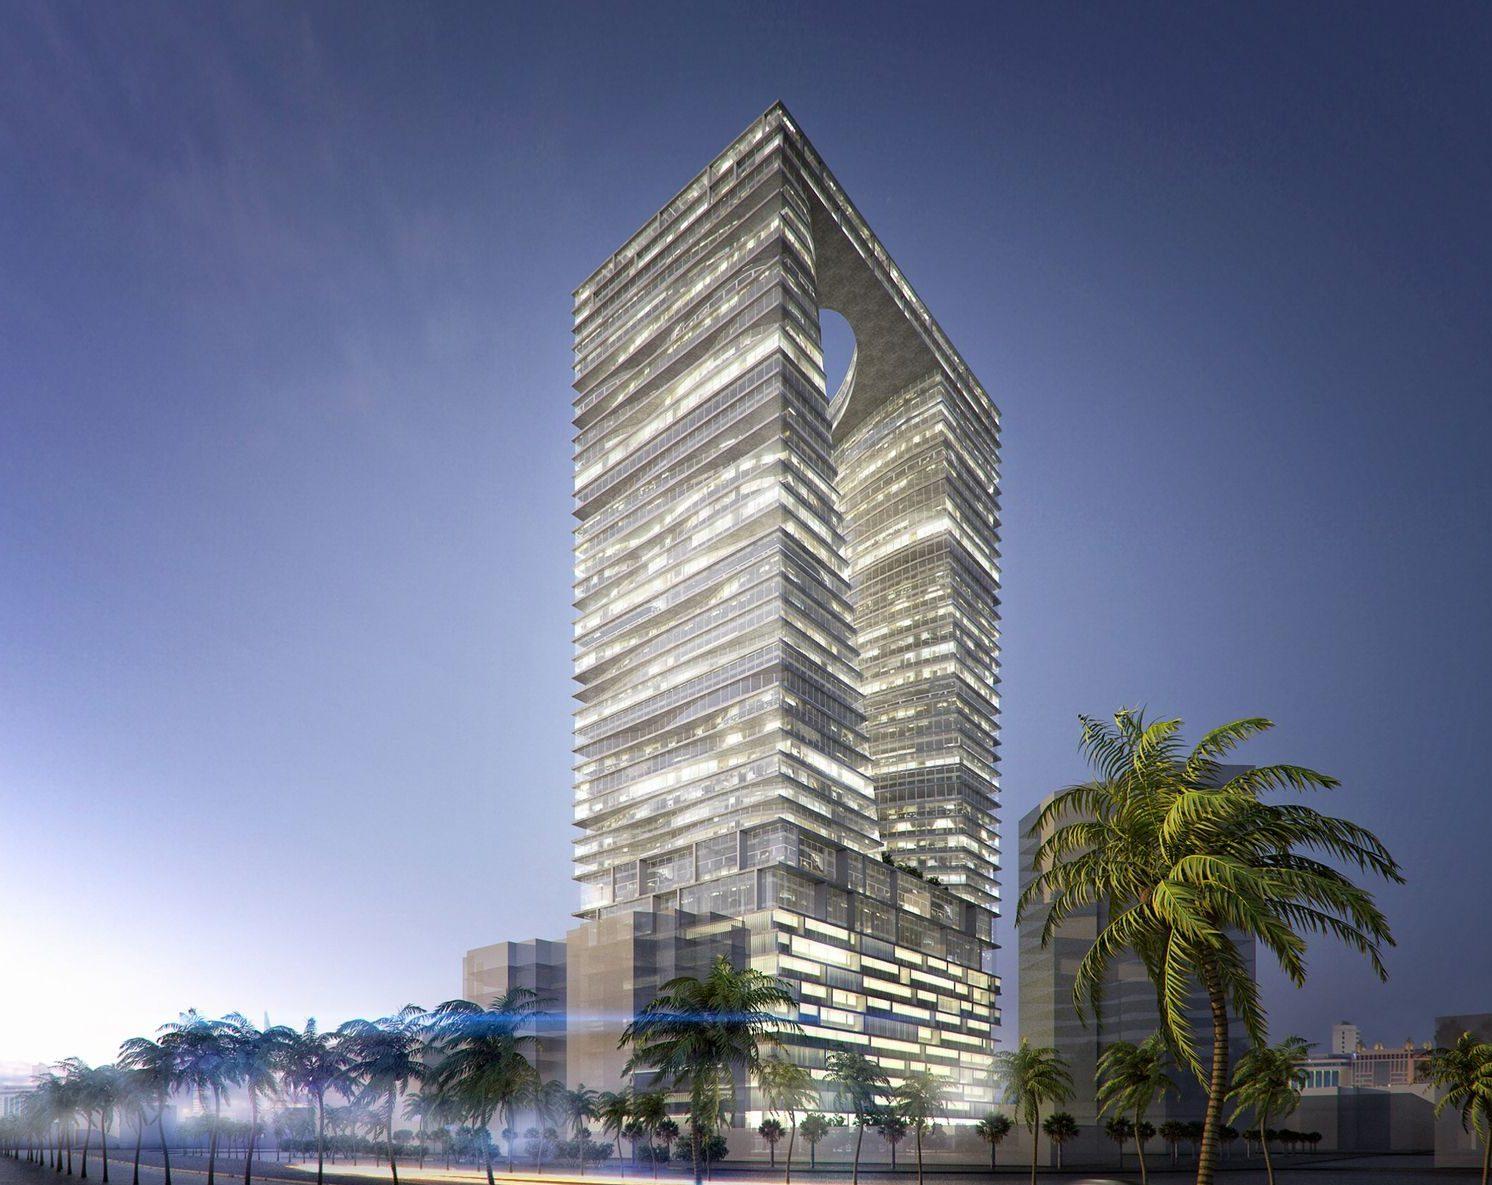 MANAMA TOWER in Bahrein